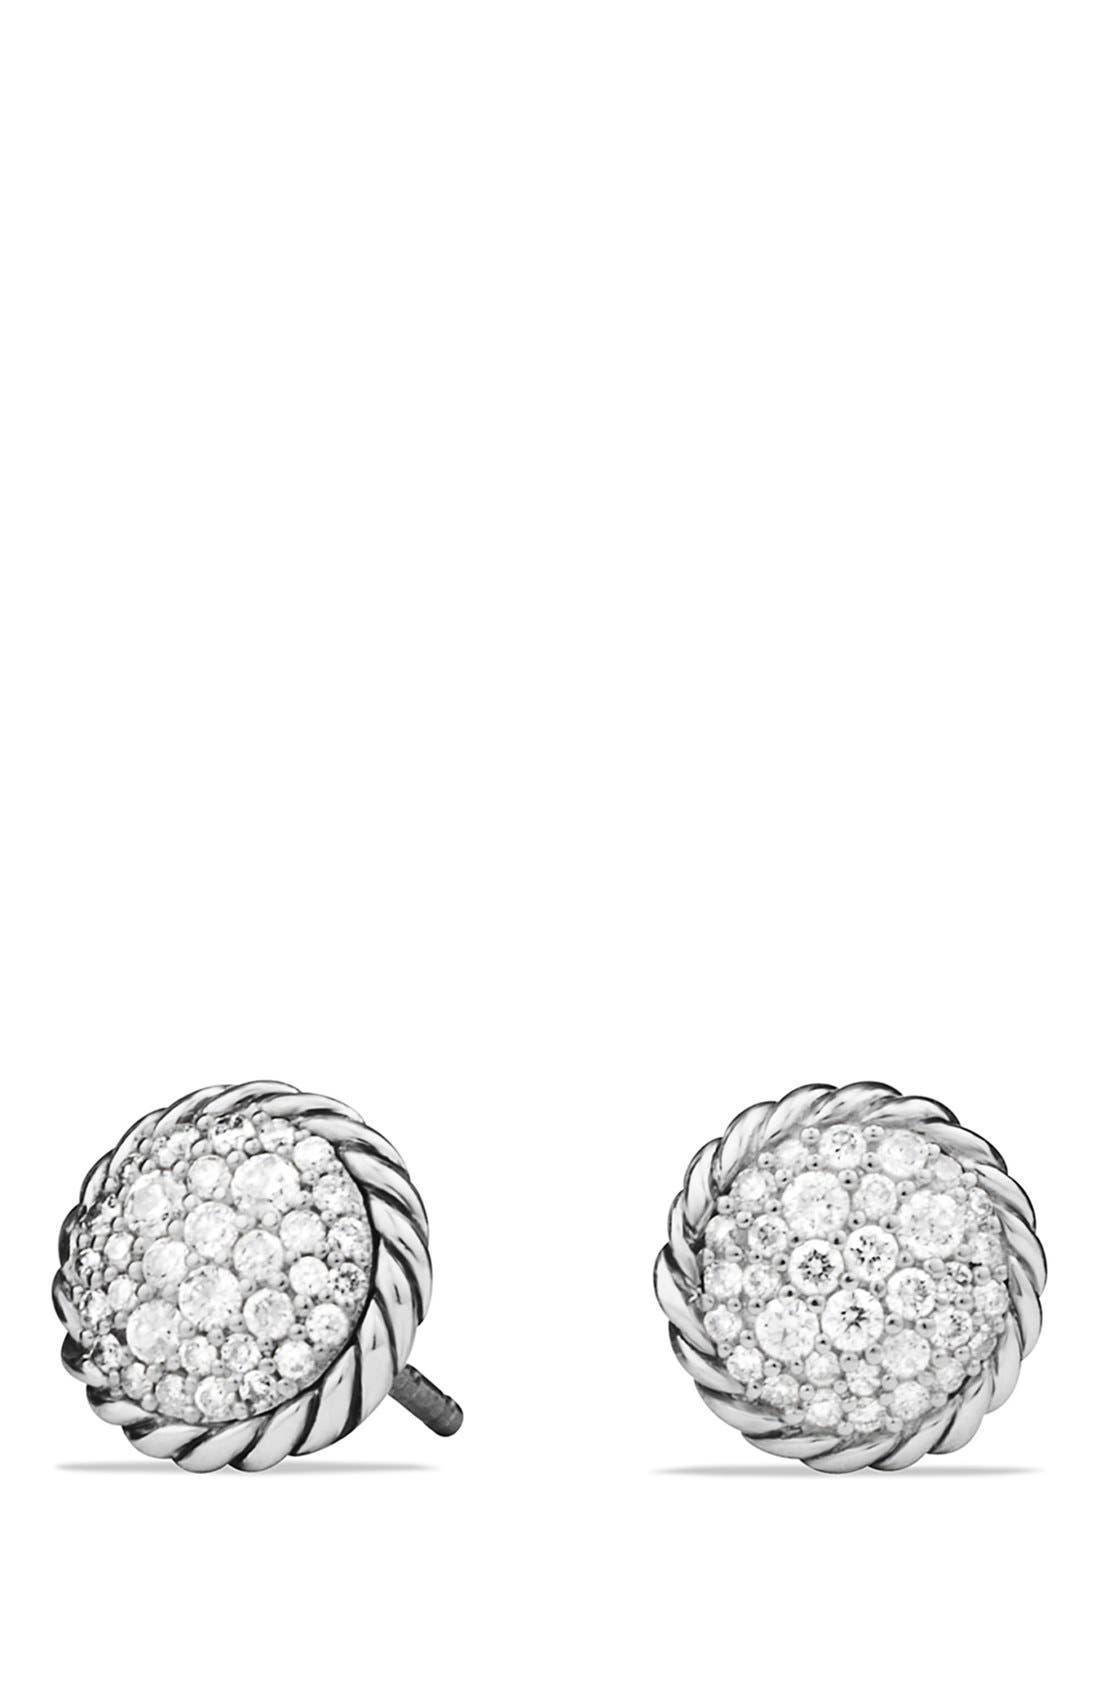 DAVID YURMAN Châtelaine Pavé Earring with Diamonds